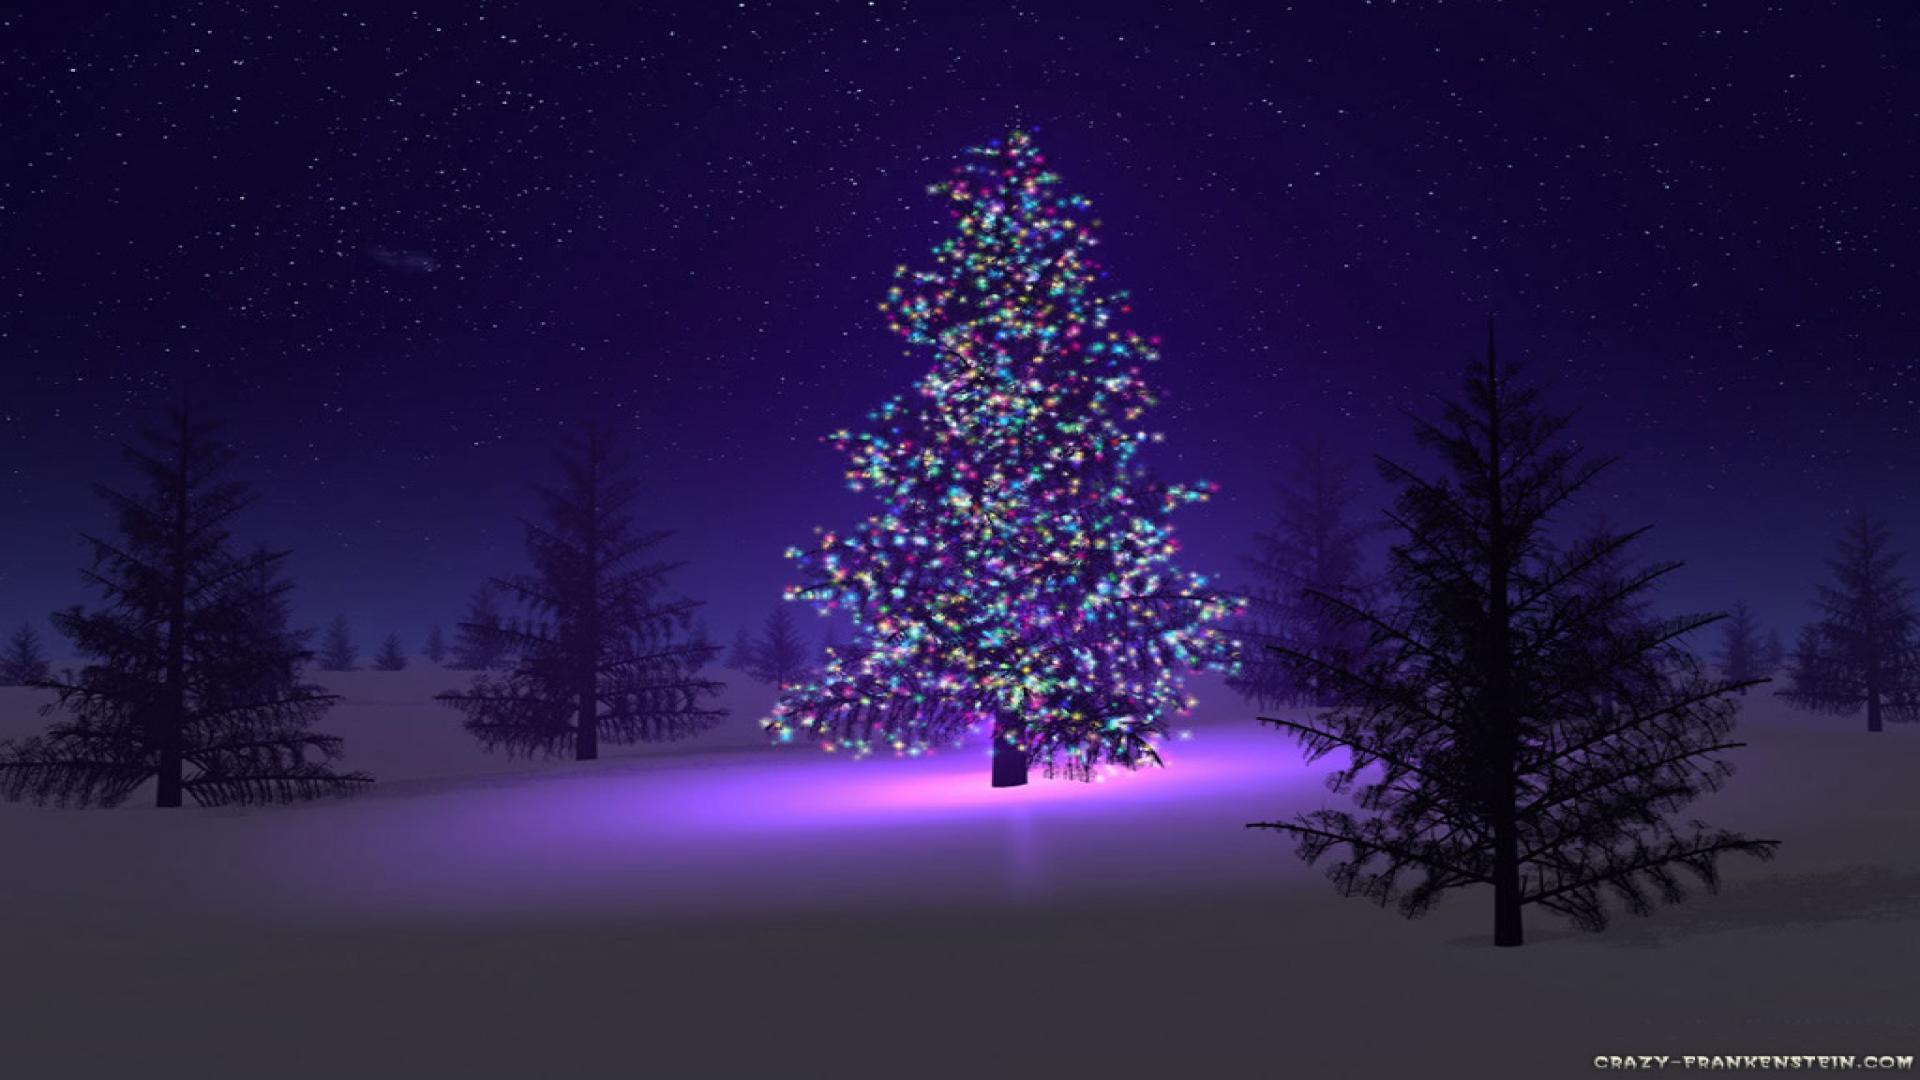 Christmas hd widescreen wallpaper 1920x1080 wallpapersafari - Hd christmas wallpapers 1080p ...